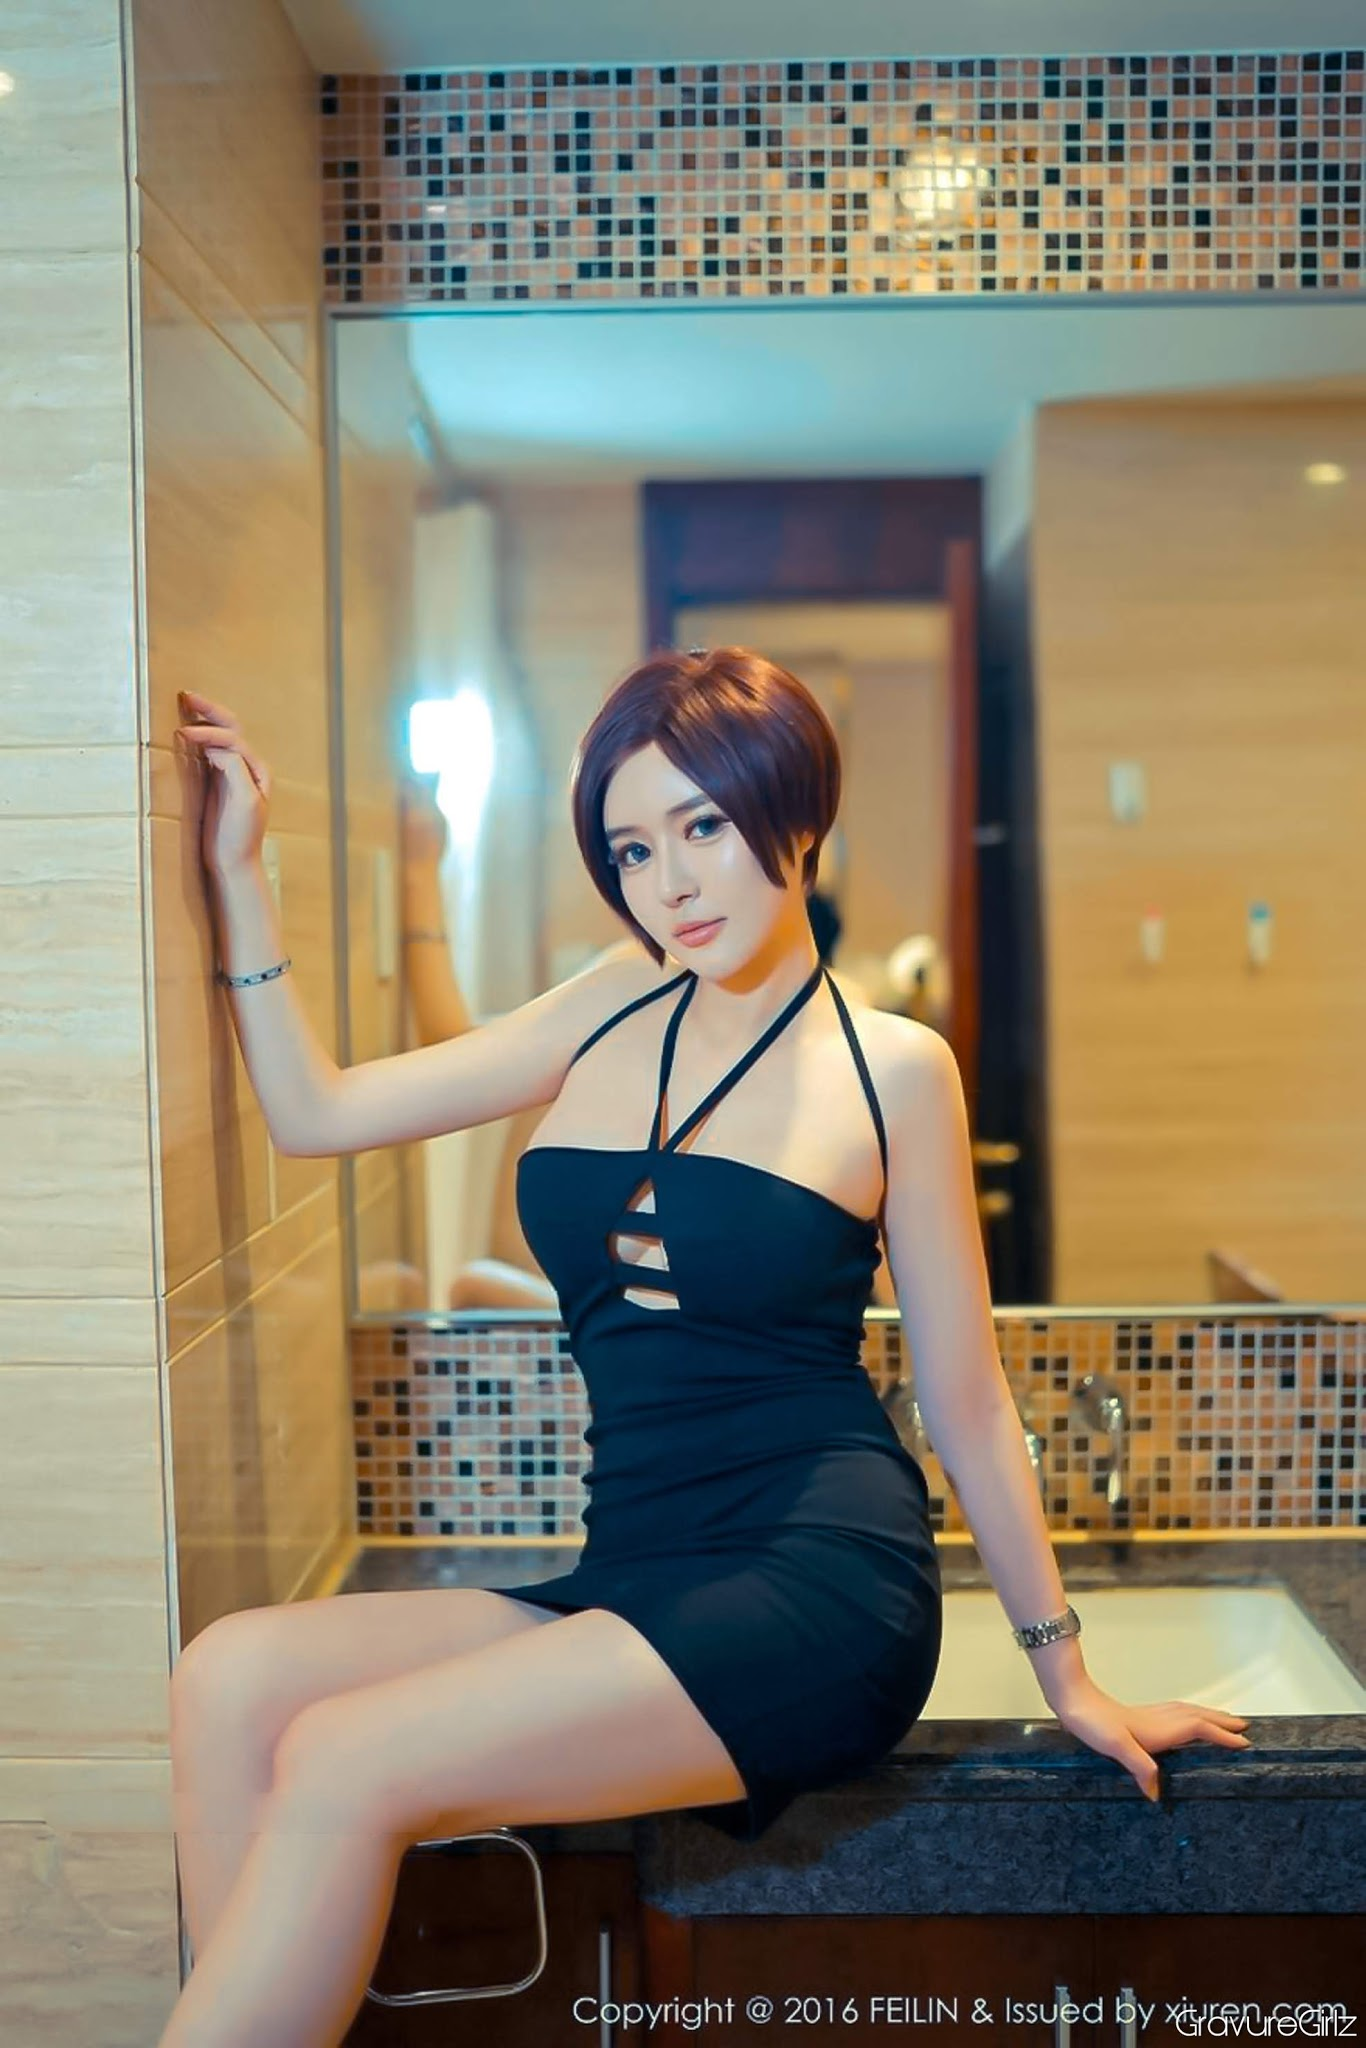 [Xiuren秀人 Girl No.133 顾欣怡 (Gu Xin Yi) 2014 | GravureGirlz